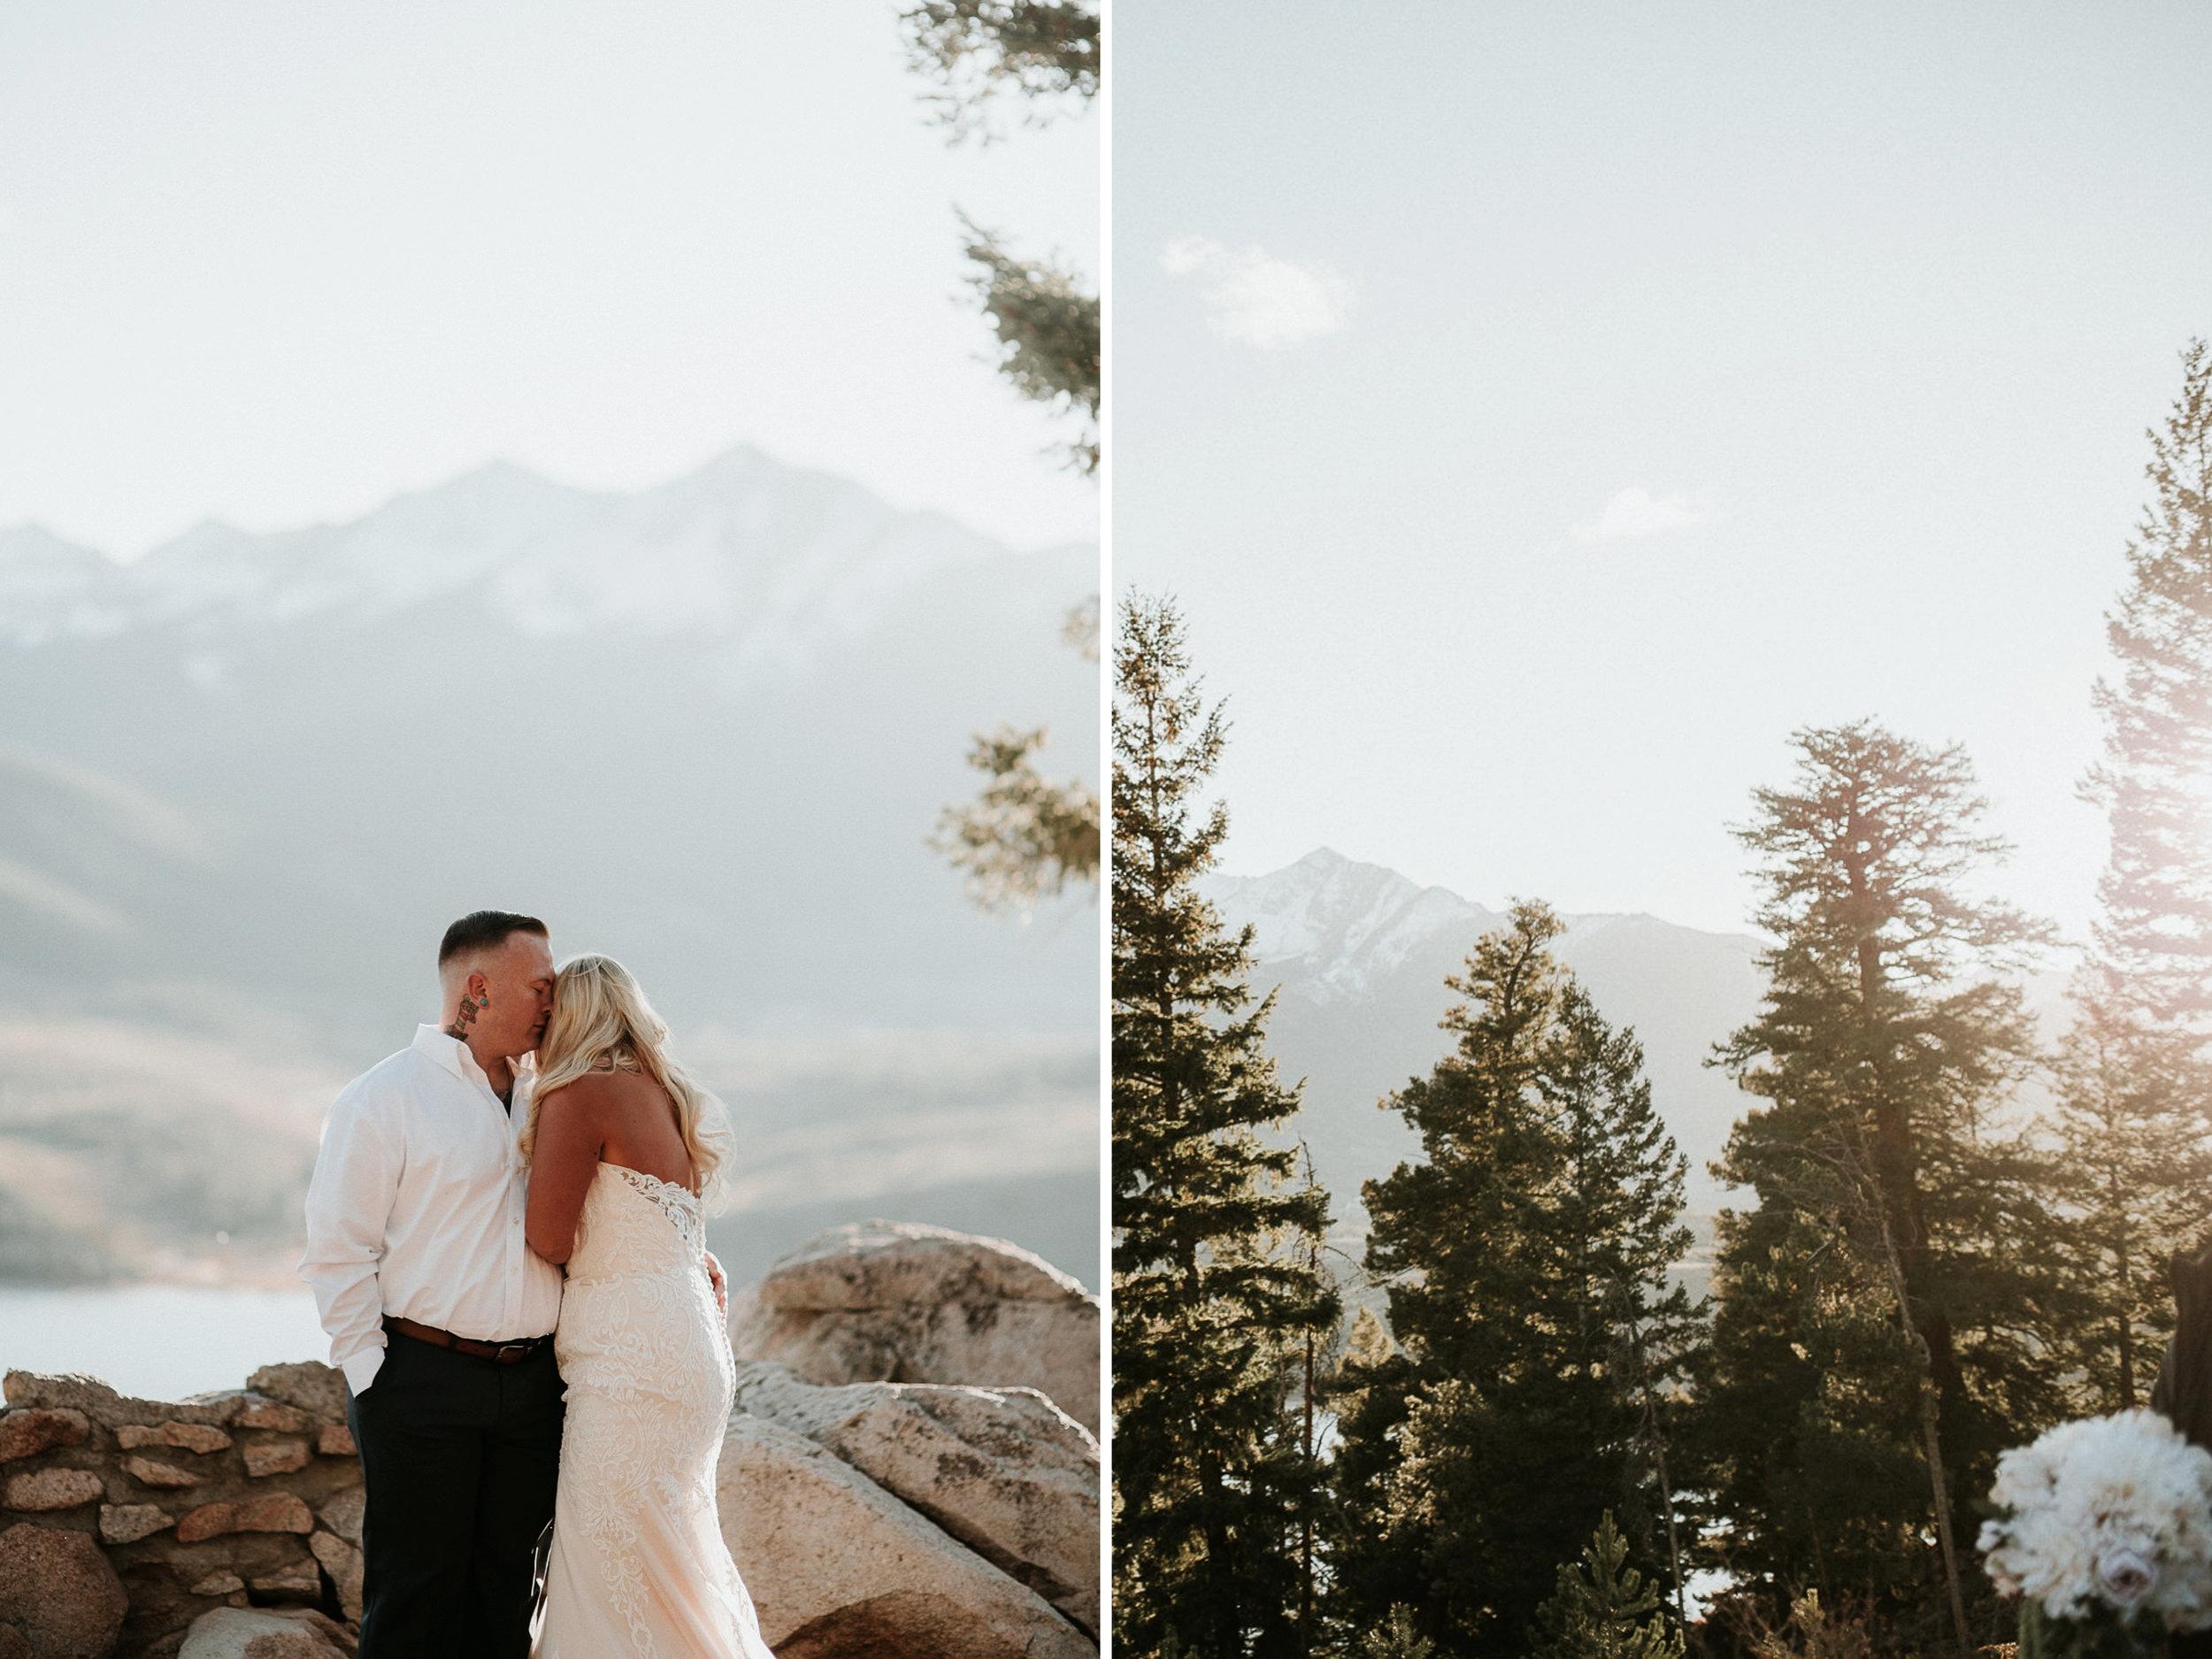 st. louis wedding photographer Zach&Rosalie - Lake Dillon CO Elopement 13.jpg